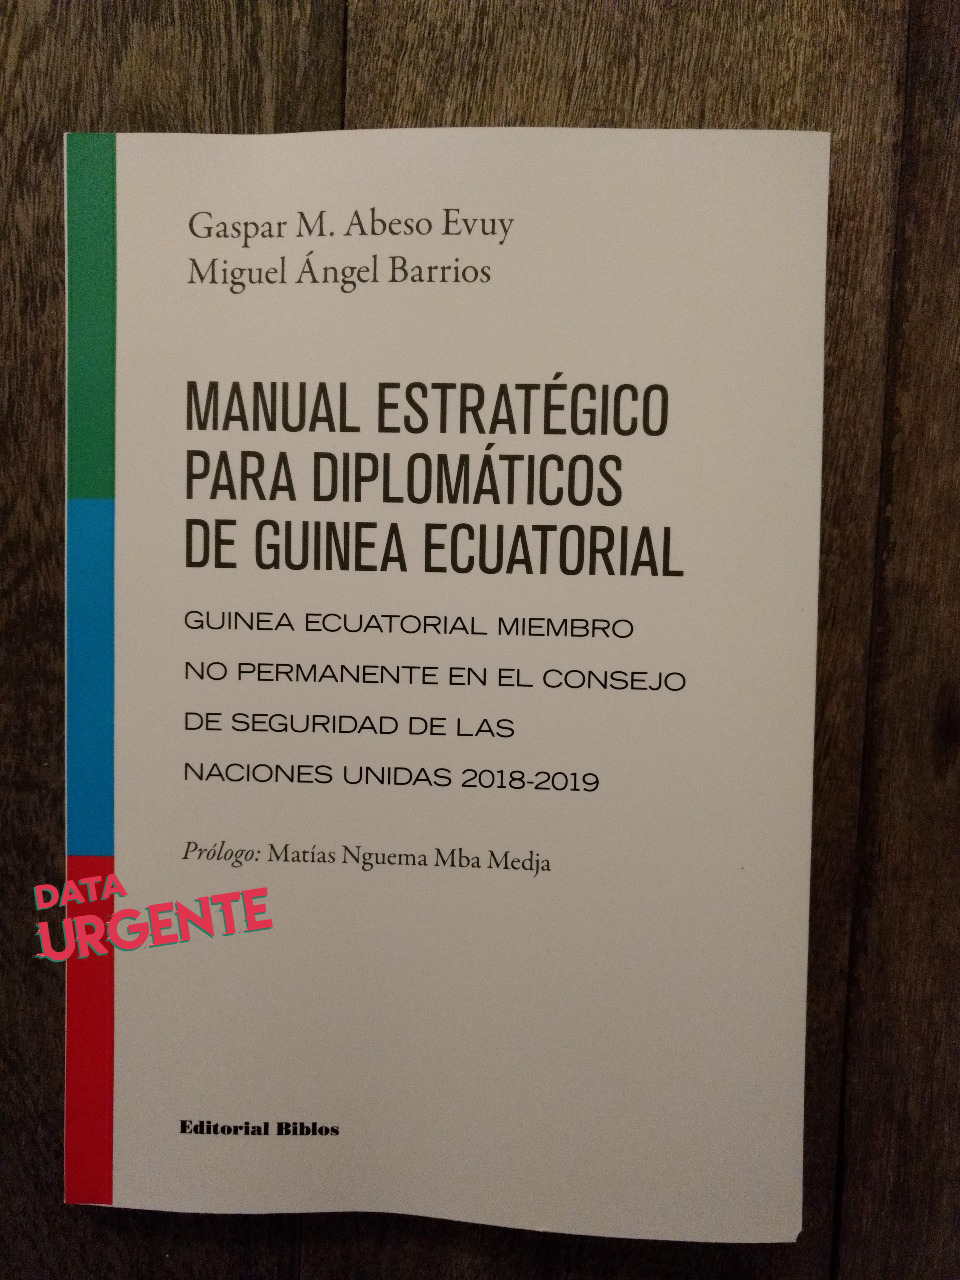 Miguel Ángel Barrios